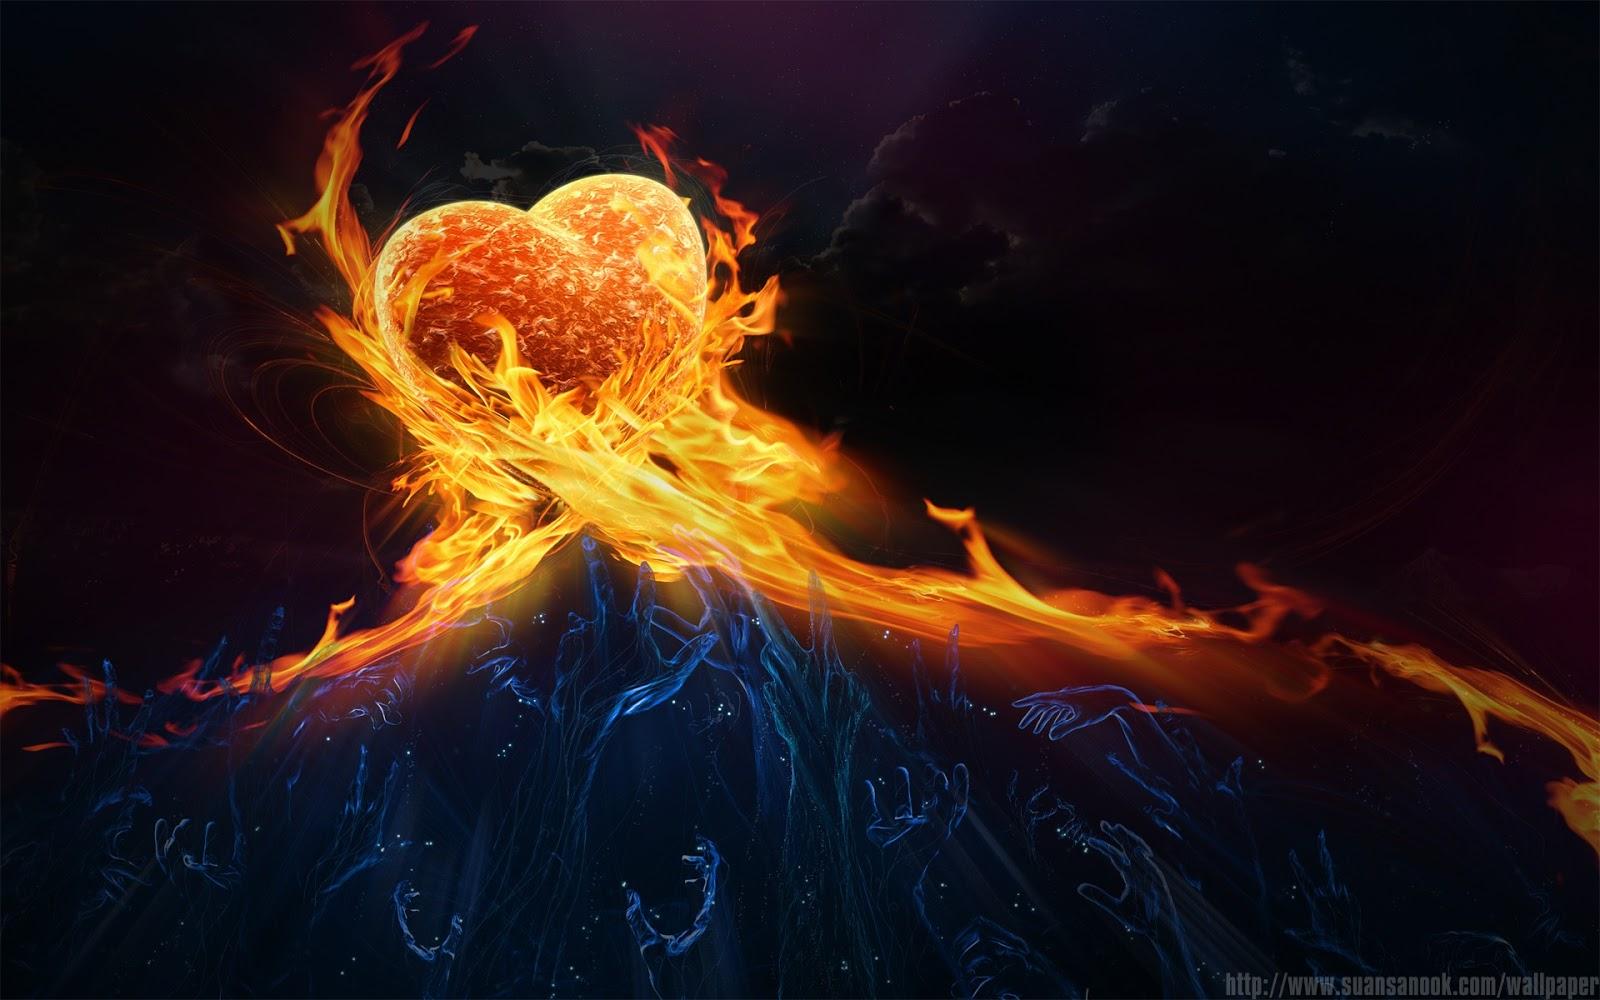 http://3.bp.blogspot.com/-9cdfgKCIAmI/UPQIMkwzxmI/AAAAAAAAAwQ/tAYrehXlh6g/s1600/wallpaper-love-heart-artistic-computer-graphic-61169.jpg